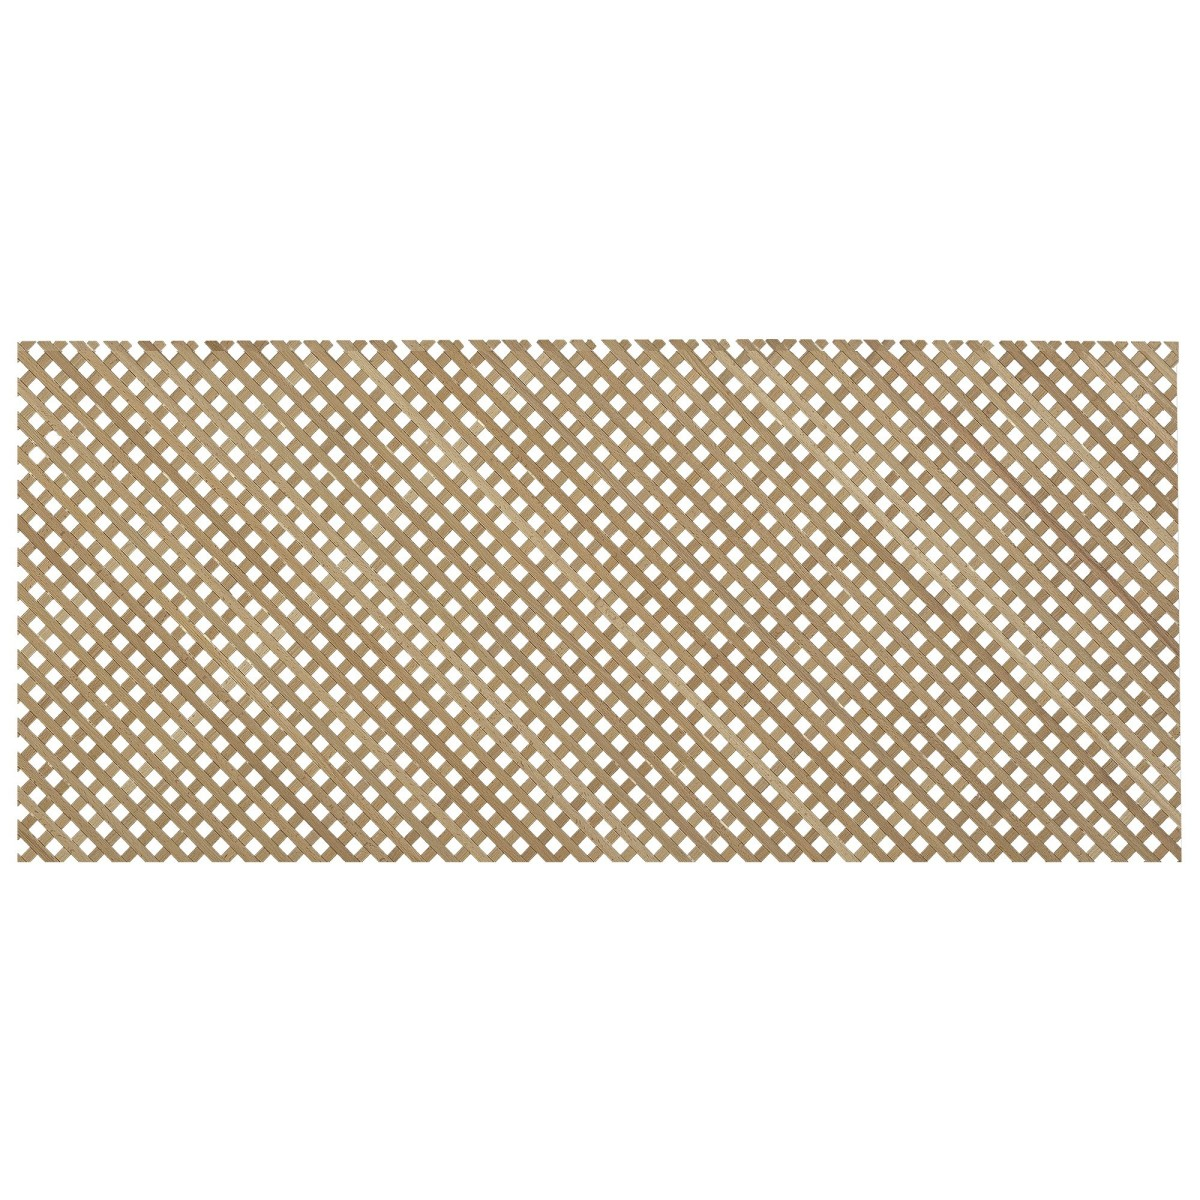 Решетка декоративная 60x200 см цвет бук